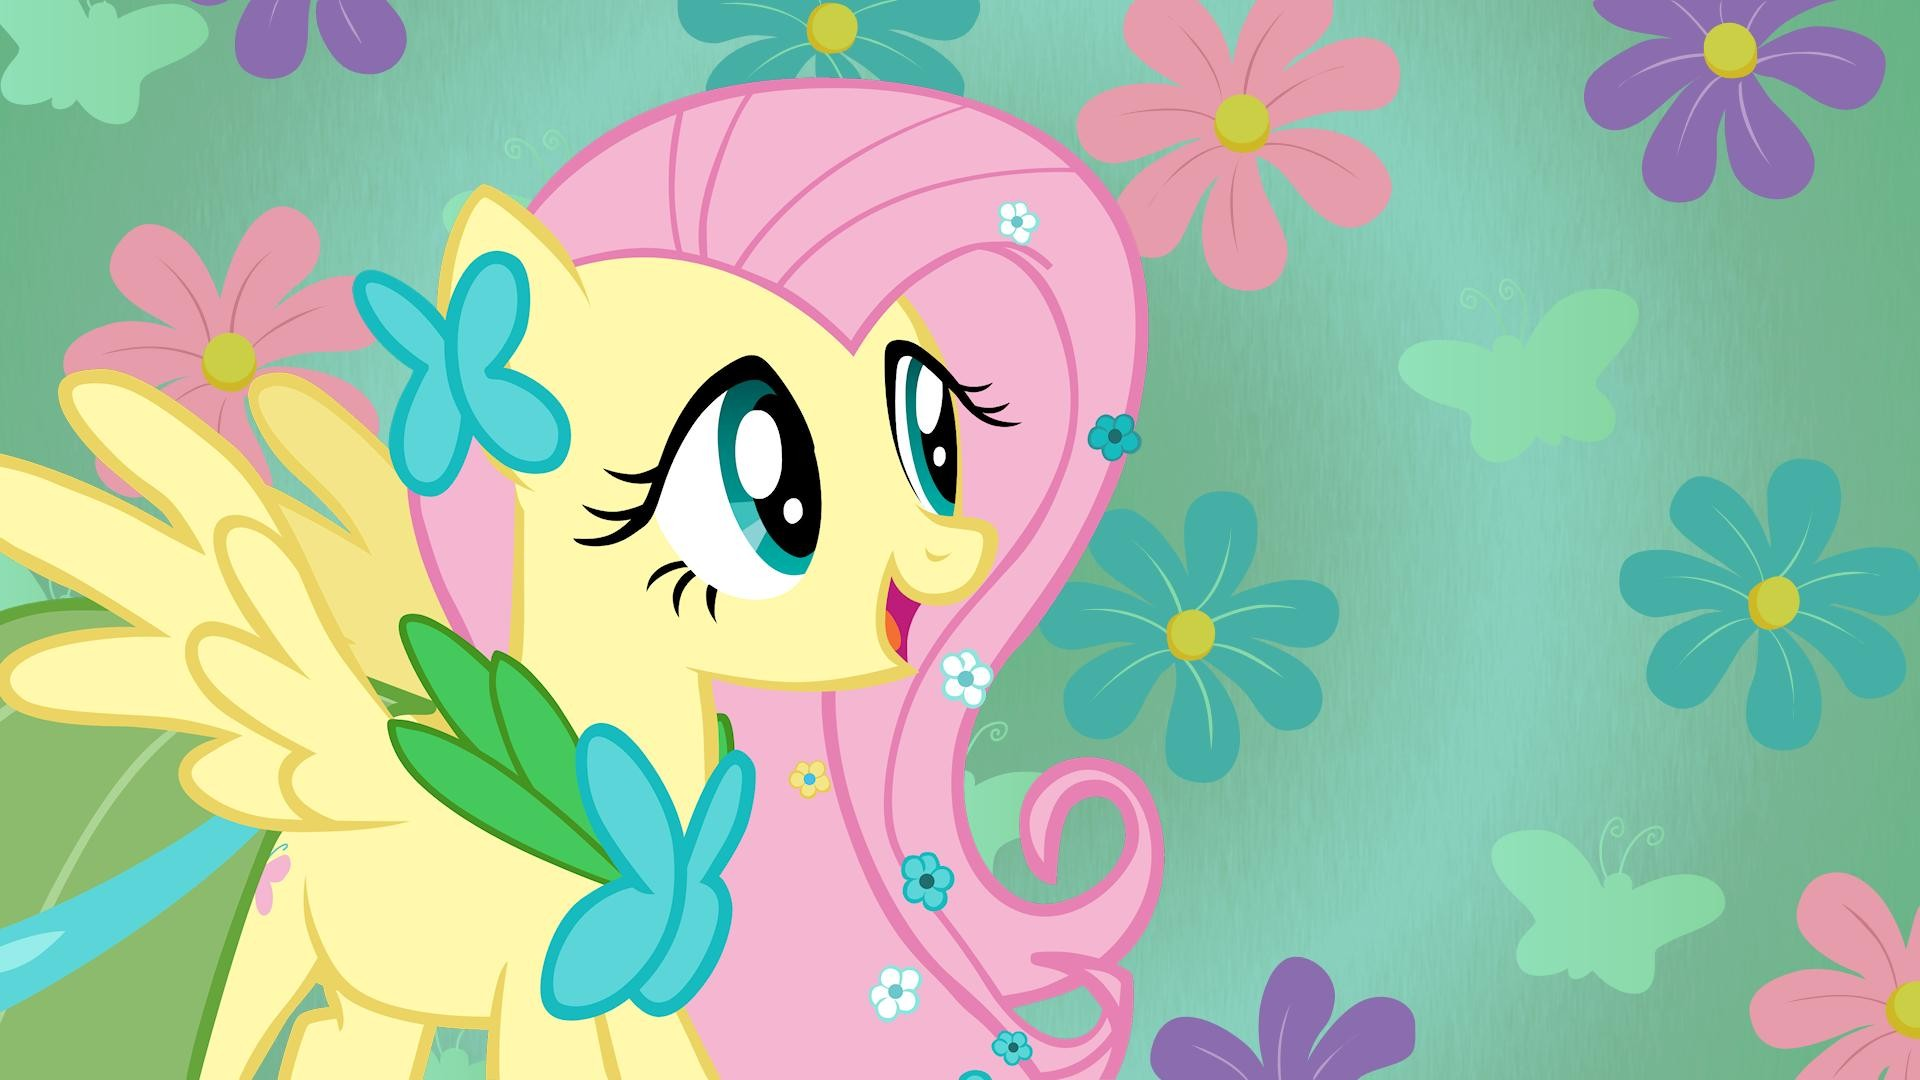 [46+] My Little Pony HD Wallpapers on WallpaperSafari